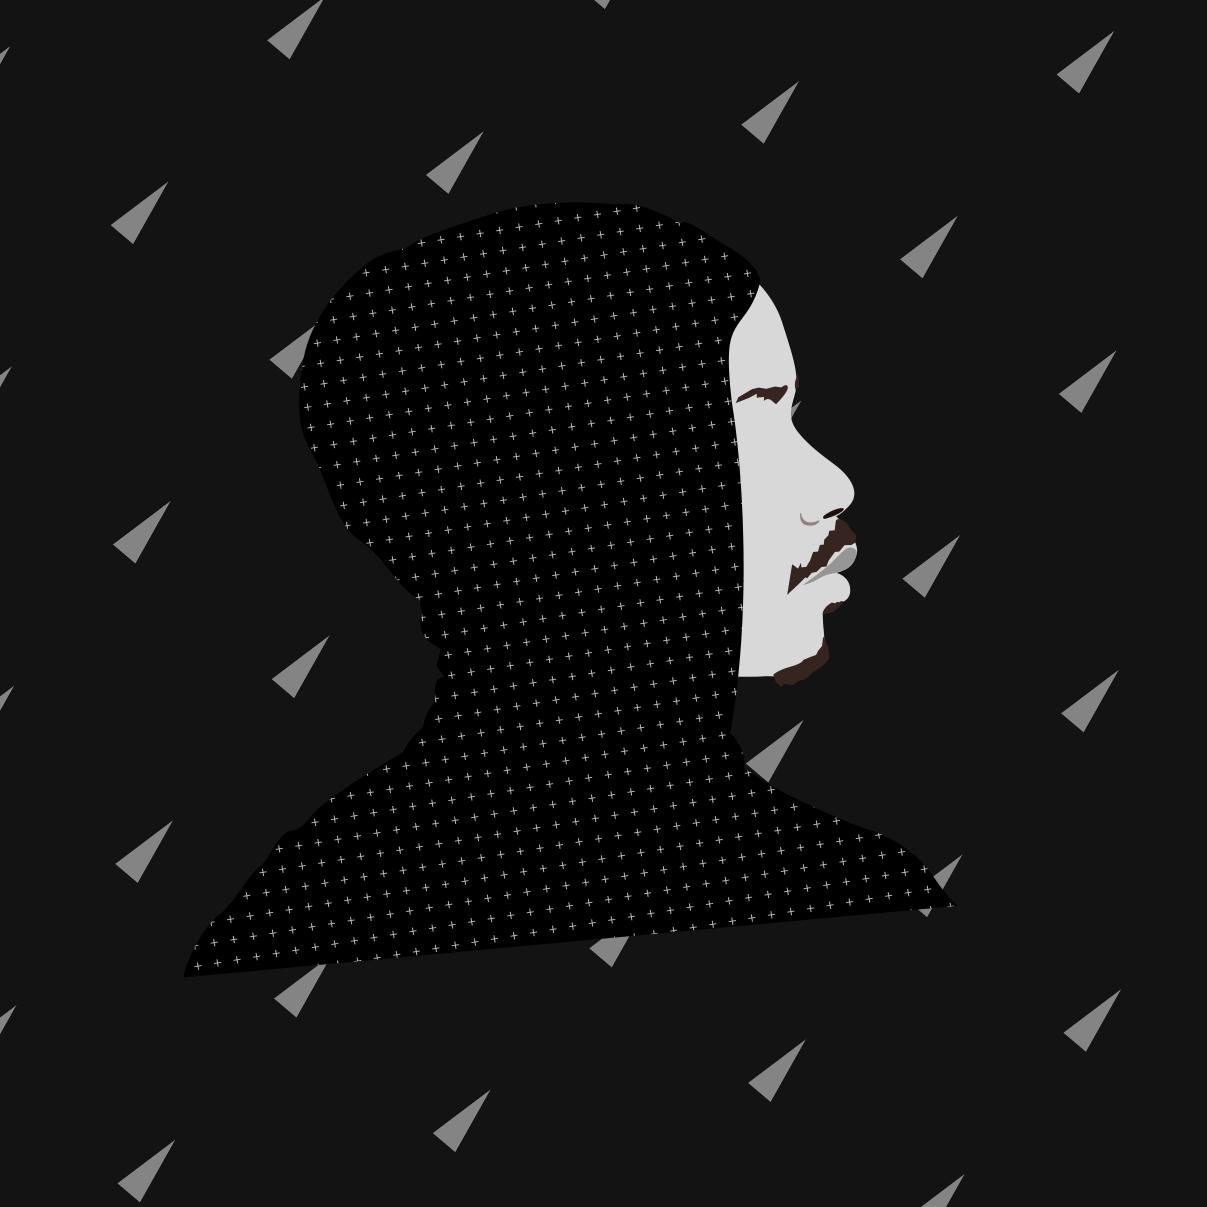 profil-ricochet-dark